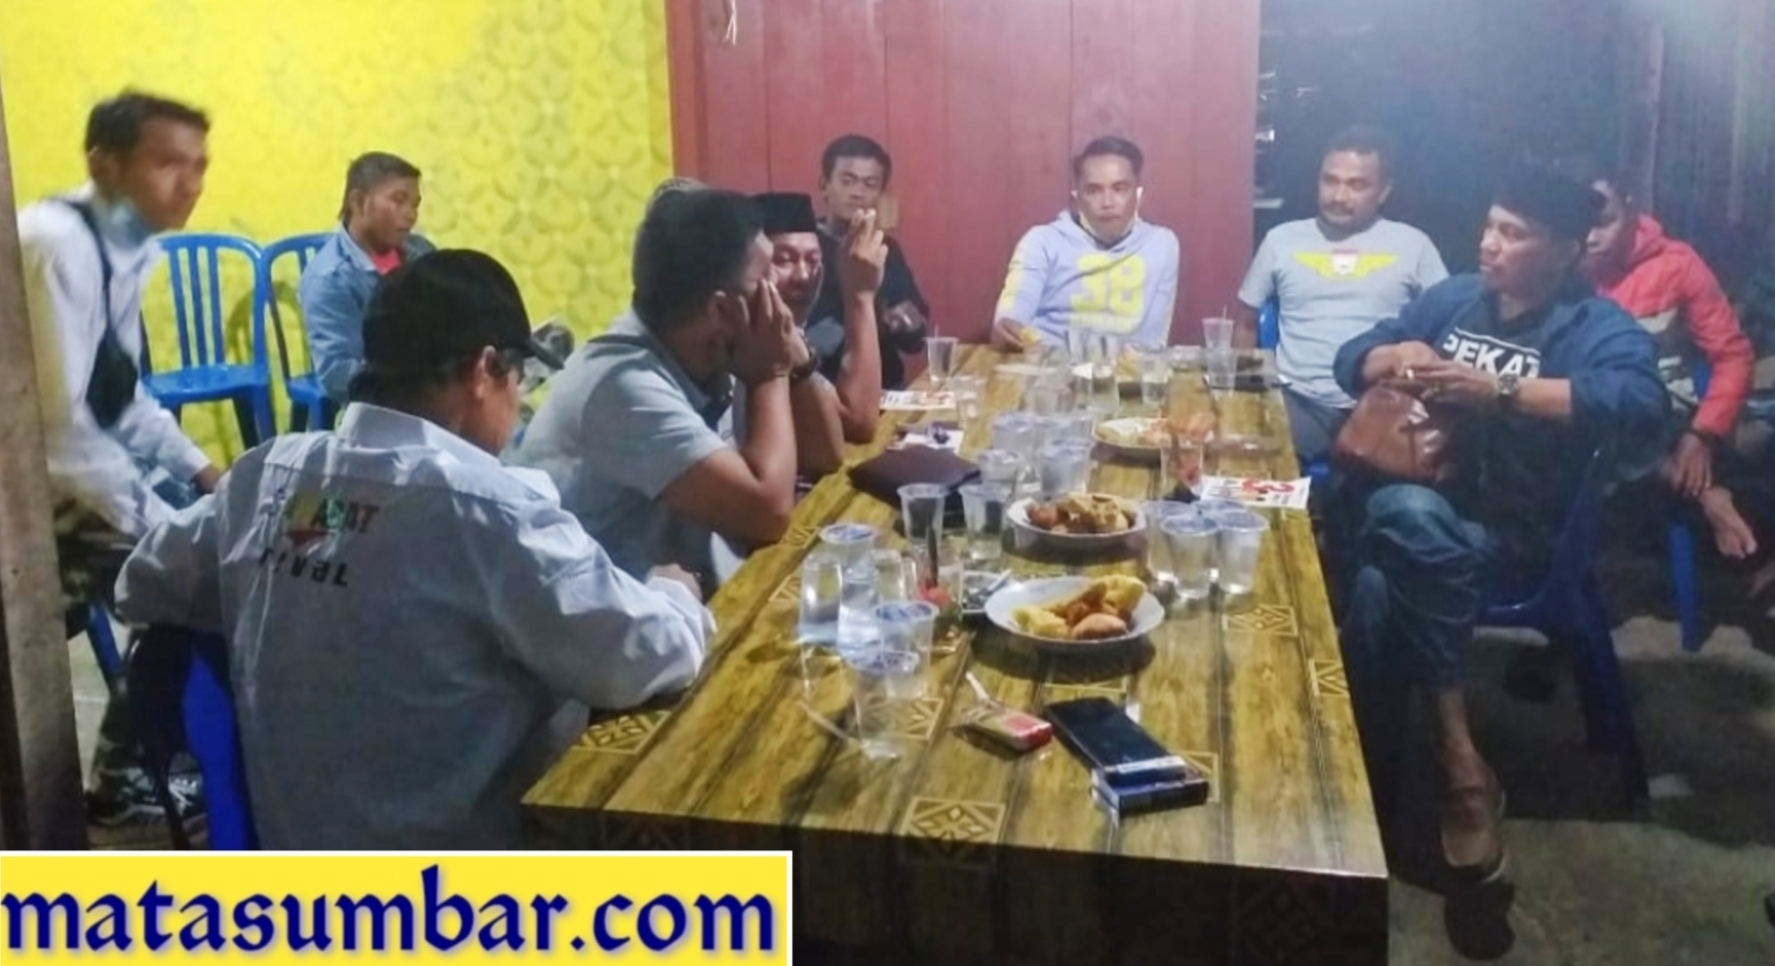 Ketua DPW Pekat IB Sumbar Kunjungi Posko Pemenangan Darmatani